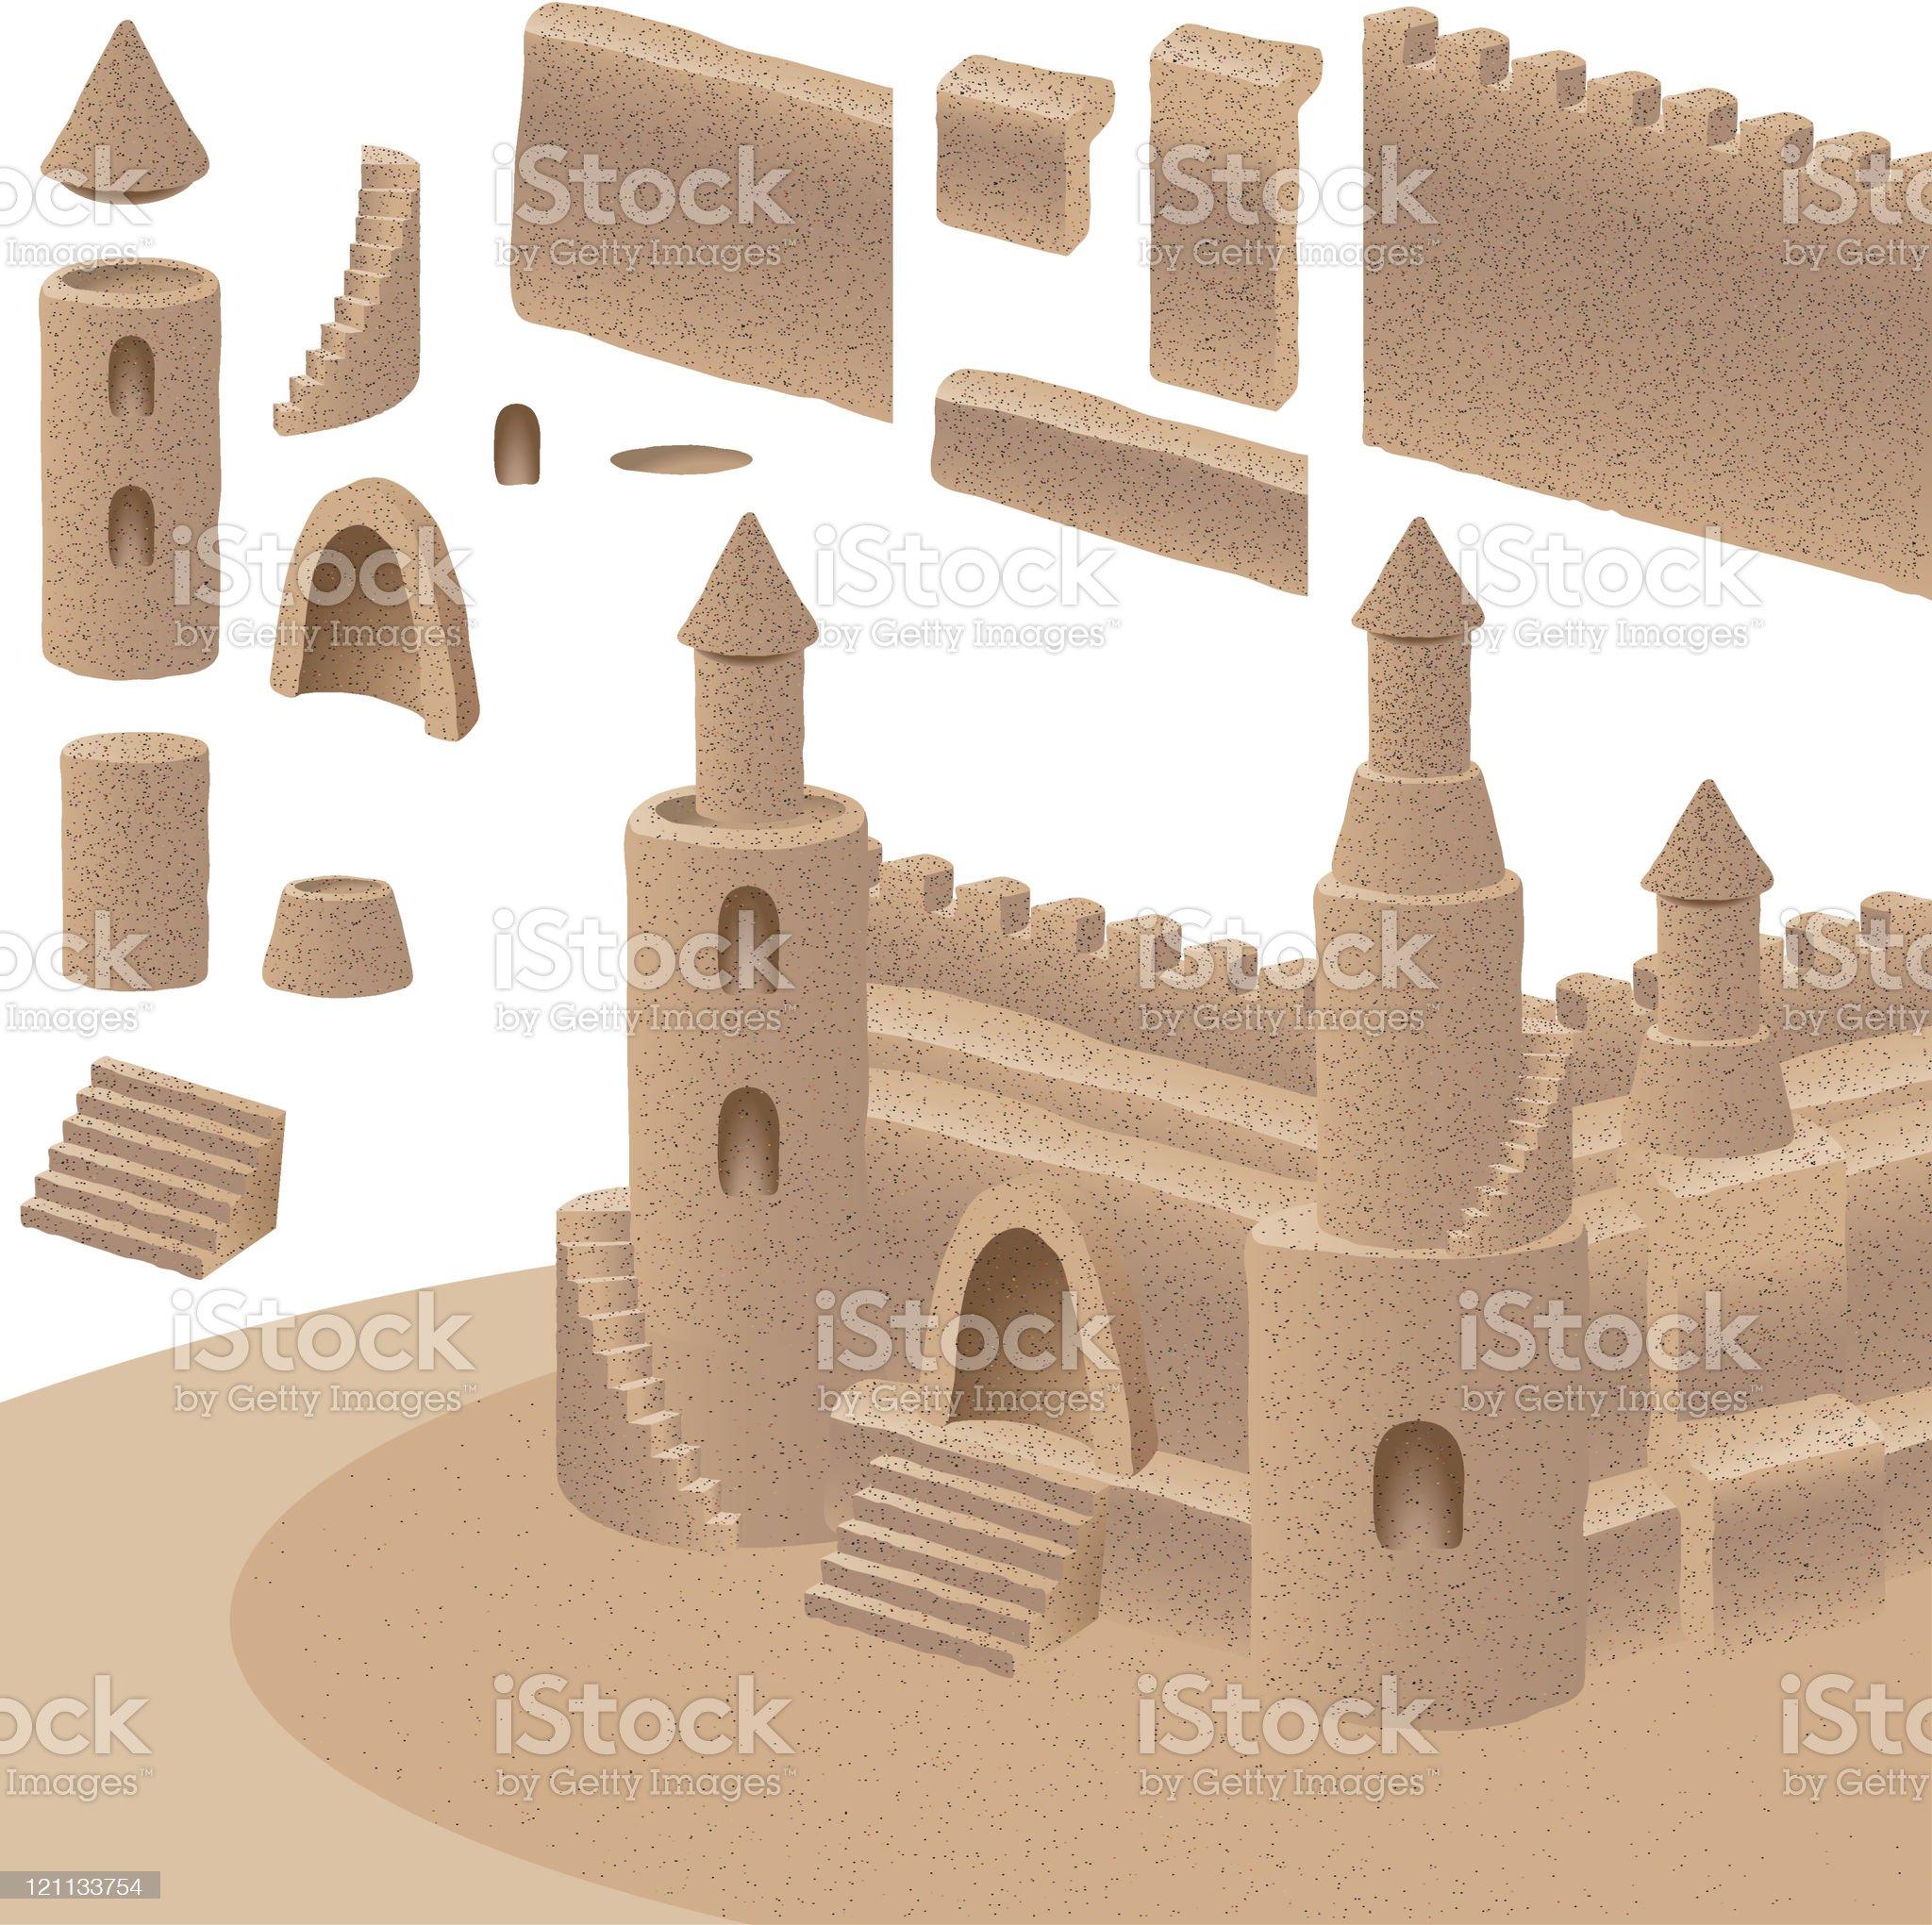 Sand Castle (CMYK) royalty-free stock vector art